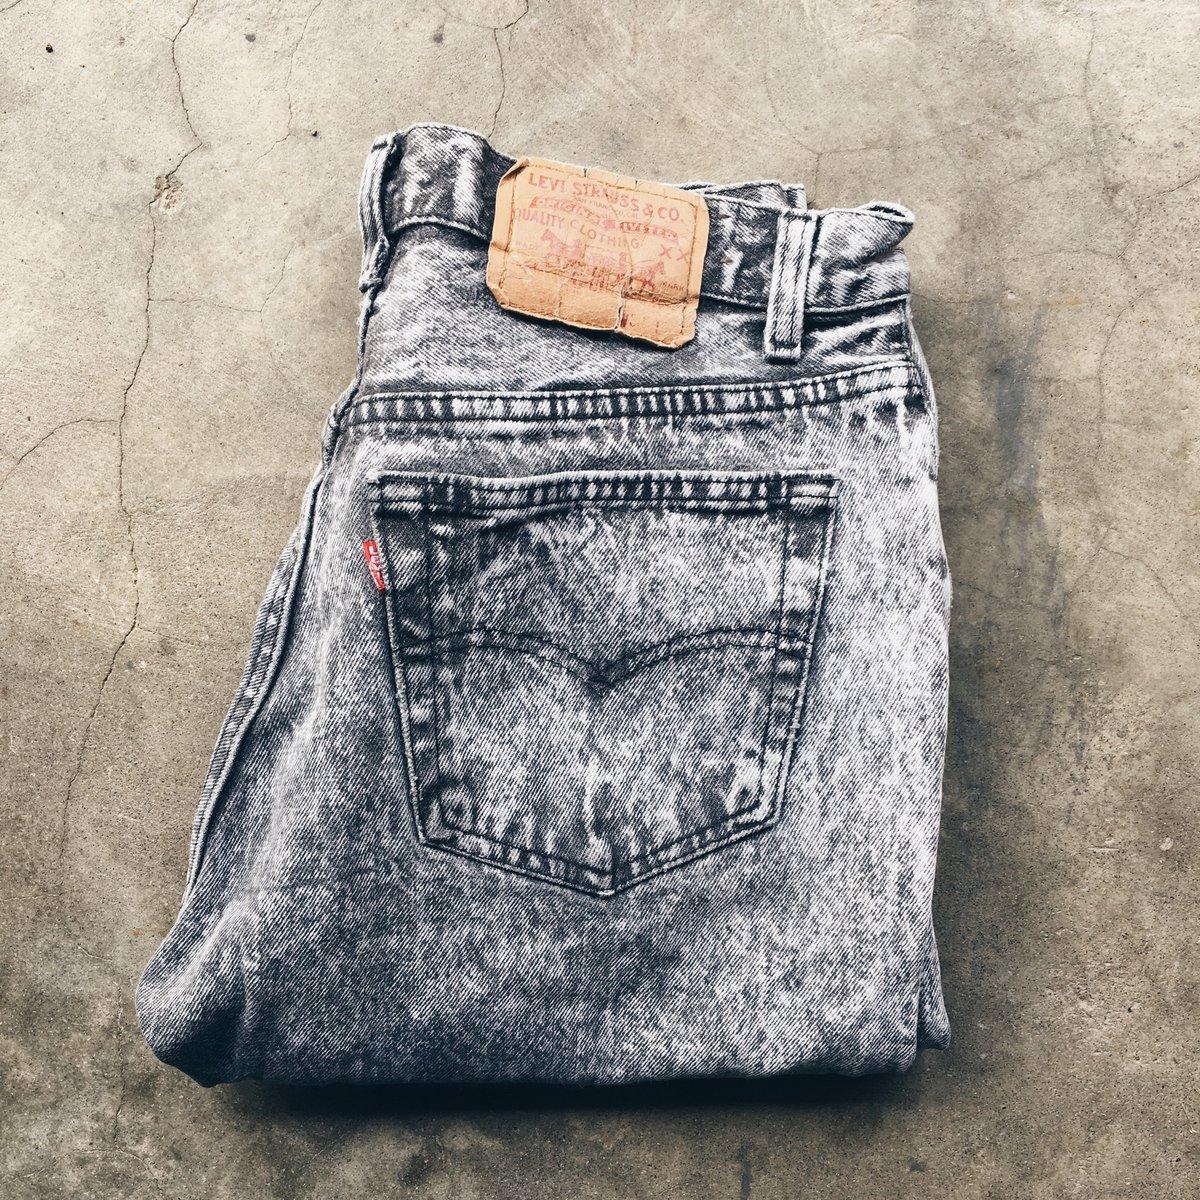 Image of Original 80's Levi's Acid Wash Jeans.